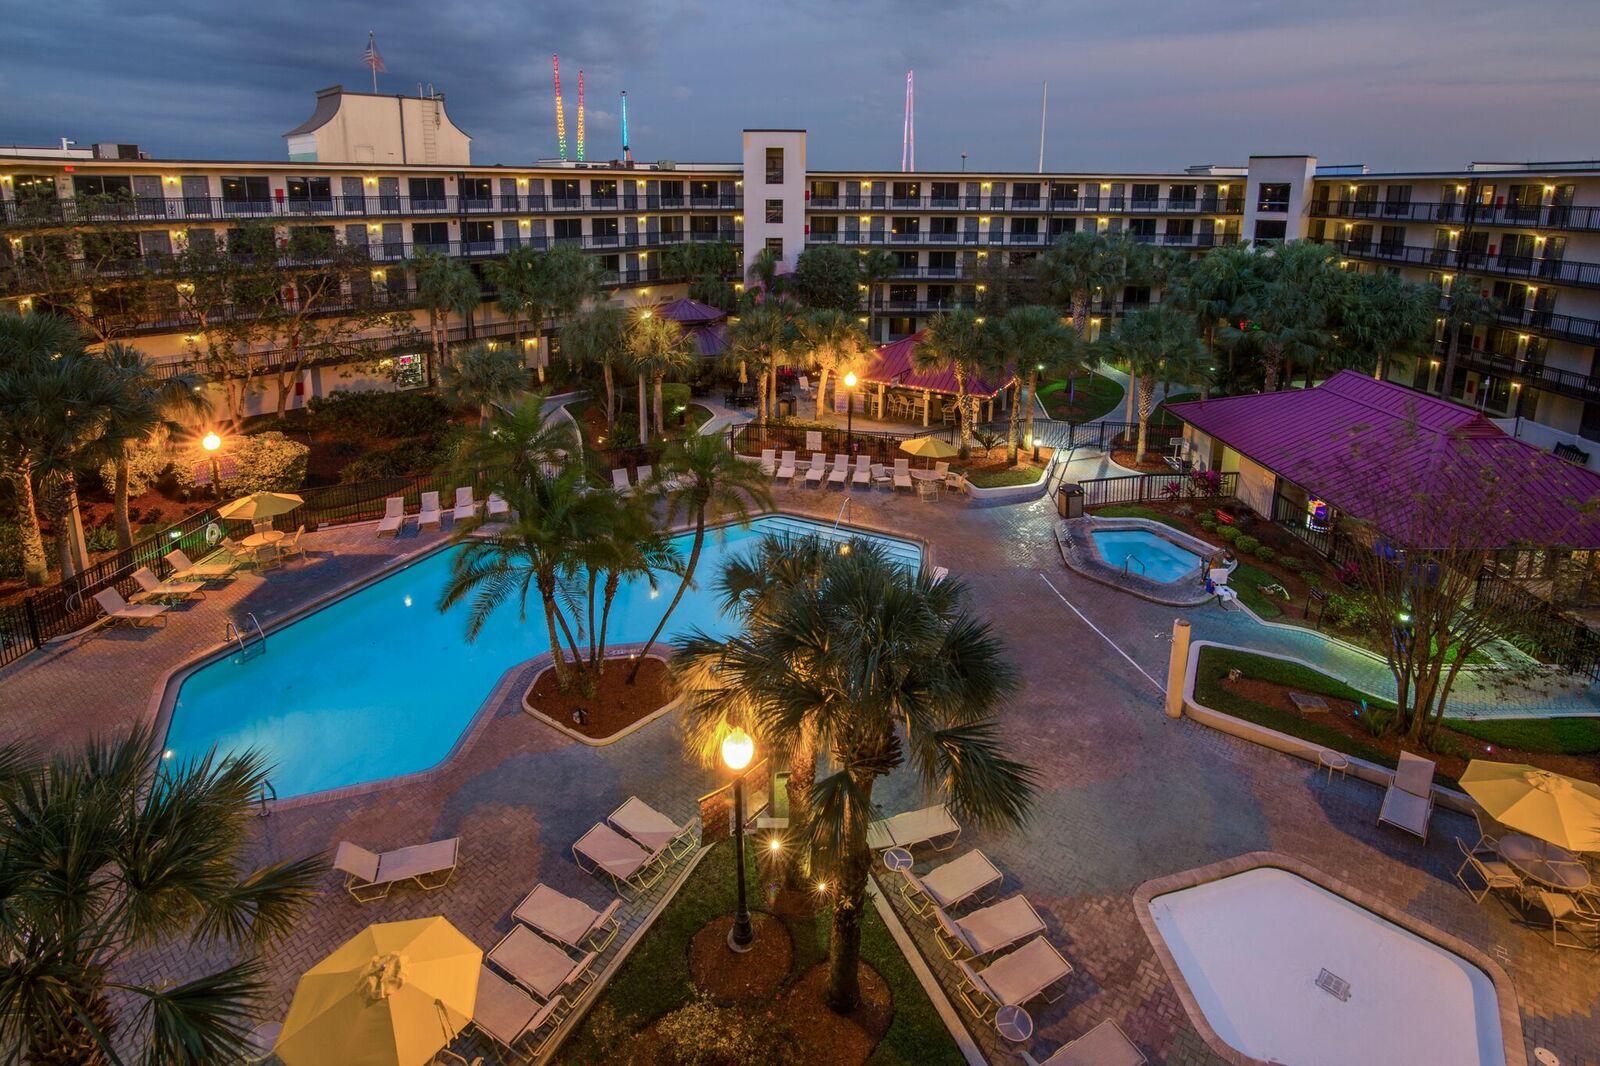 Staybridge Suites Royale Parc Orlando Tropical Pool Area 4